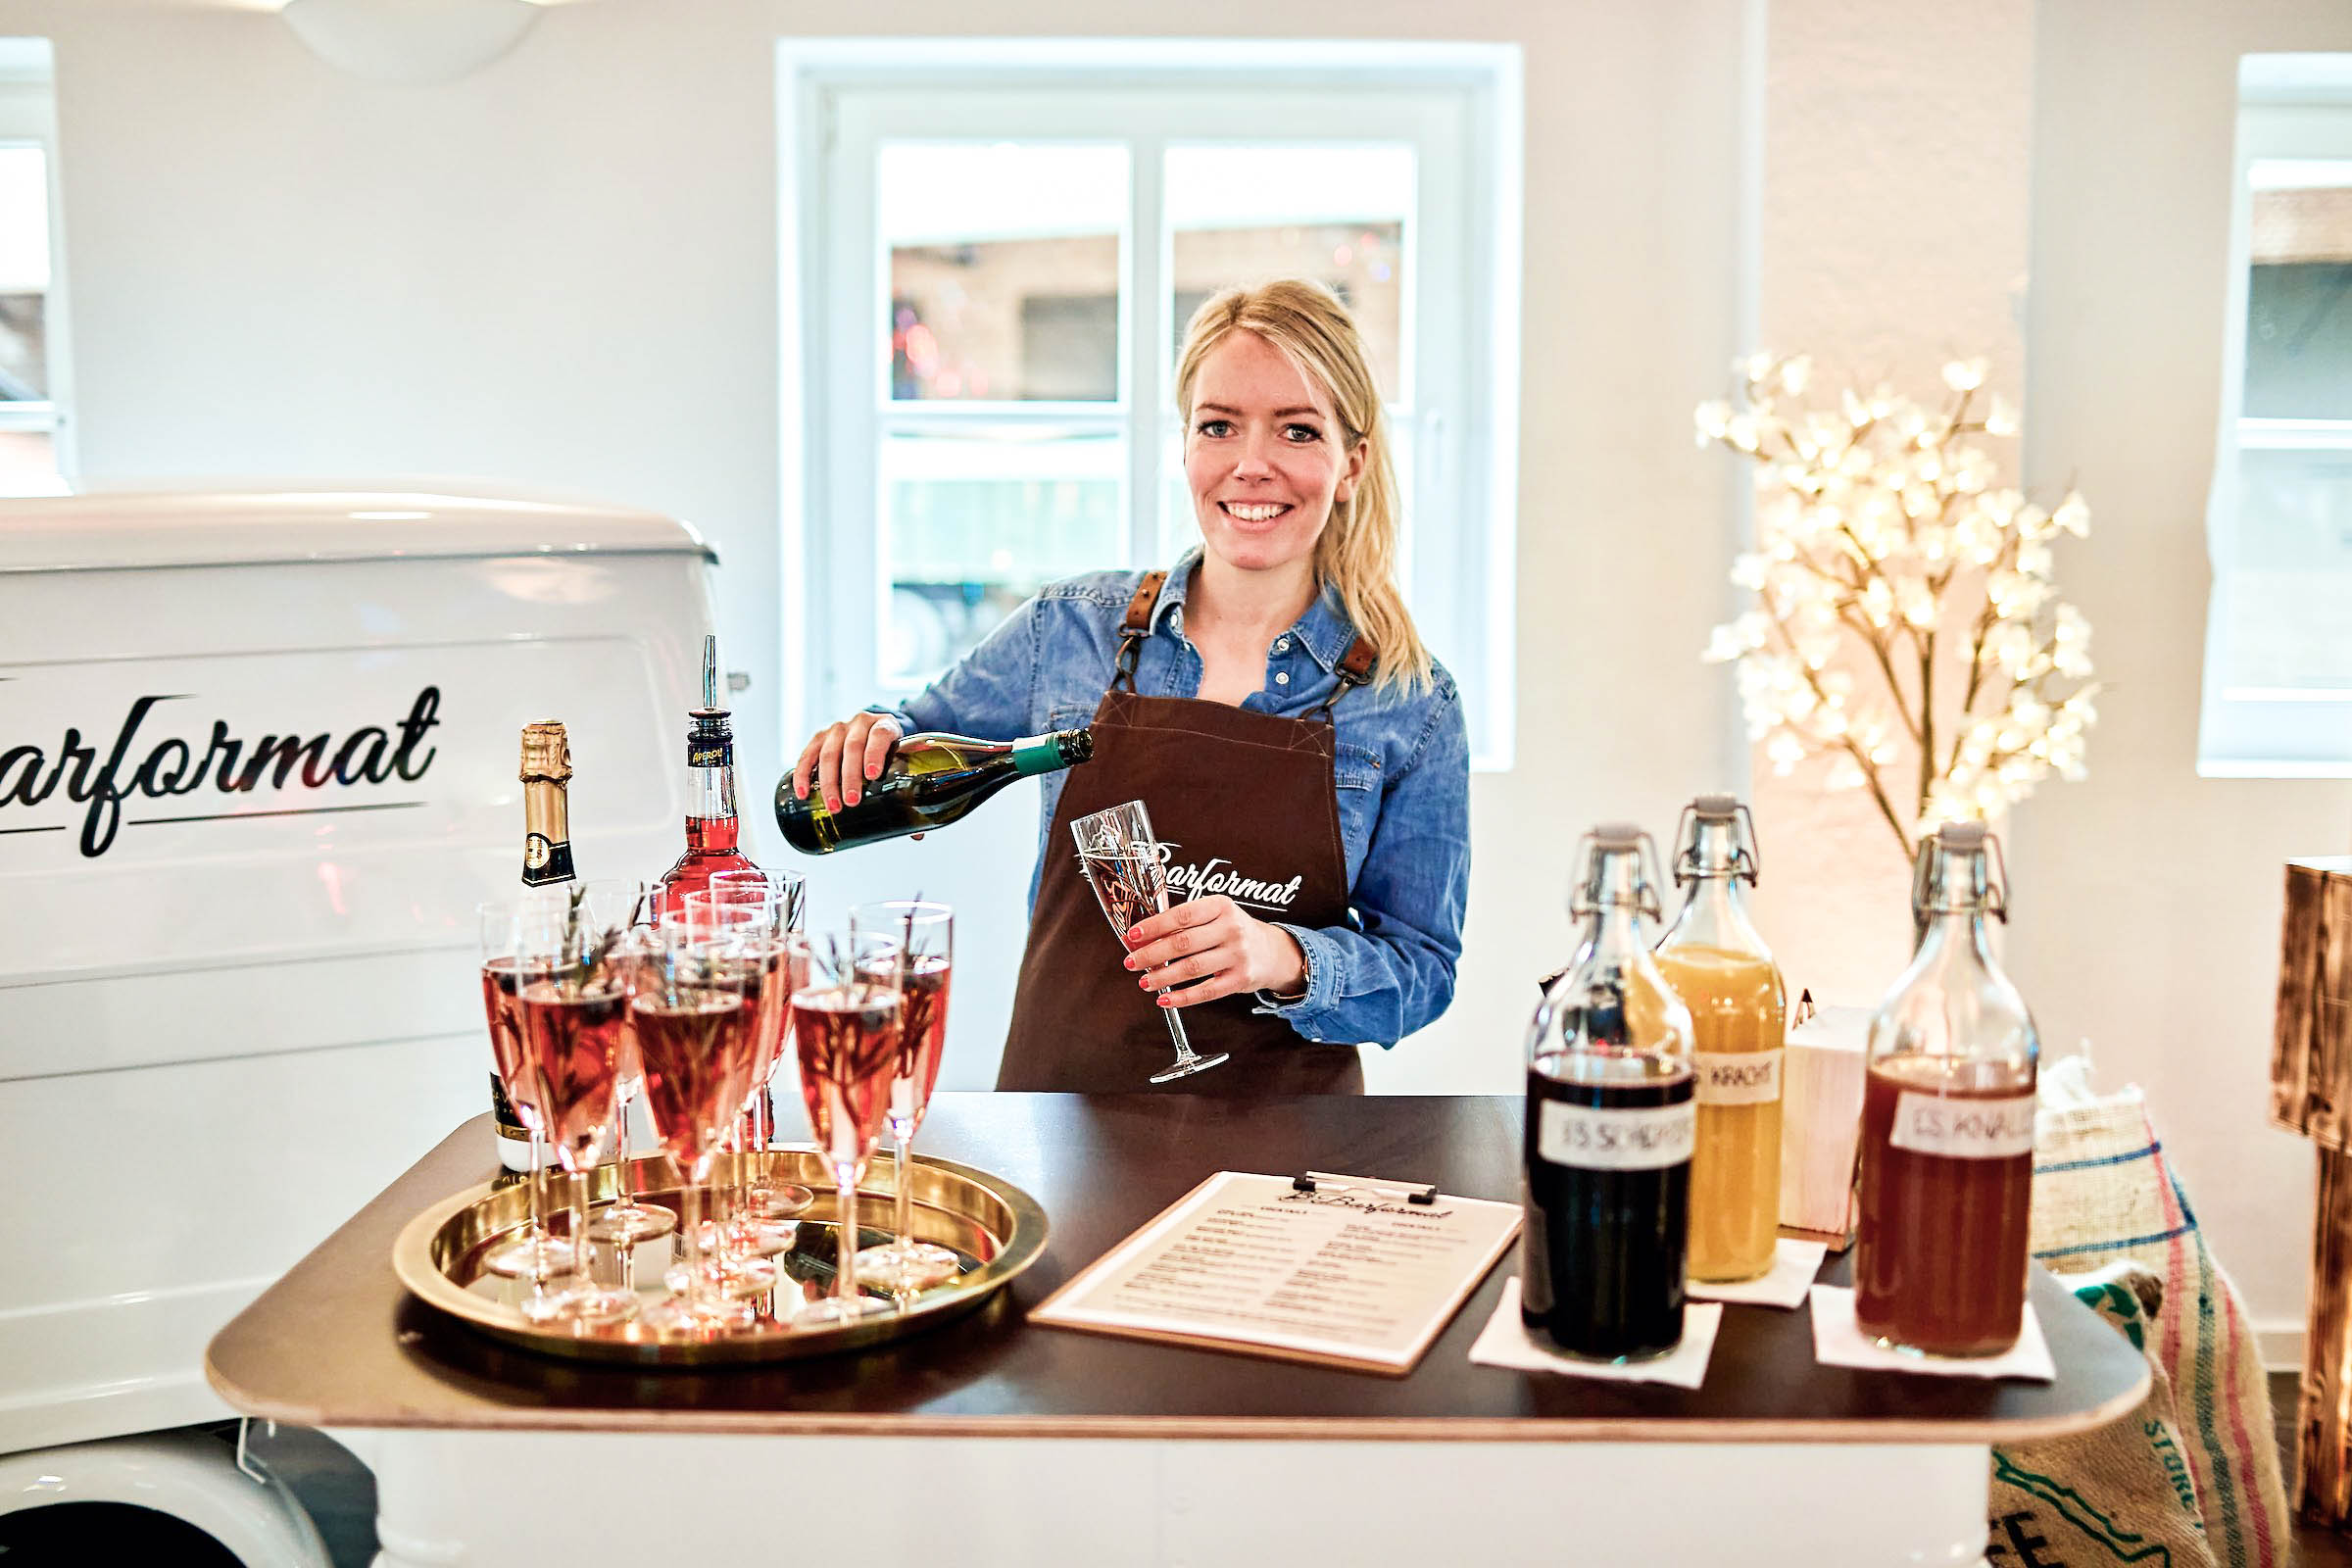 Mobile | Bar | Ape | Bulli | Cocktailservice | Getränke | Catering | Sektbar | Hannover | Sektempfang | Standesamt | Hochzeit | Barkeeper | Kellner | Hochzeit | Event | Mieten | Buchen | Lehmann | Eventservice